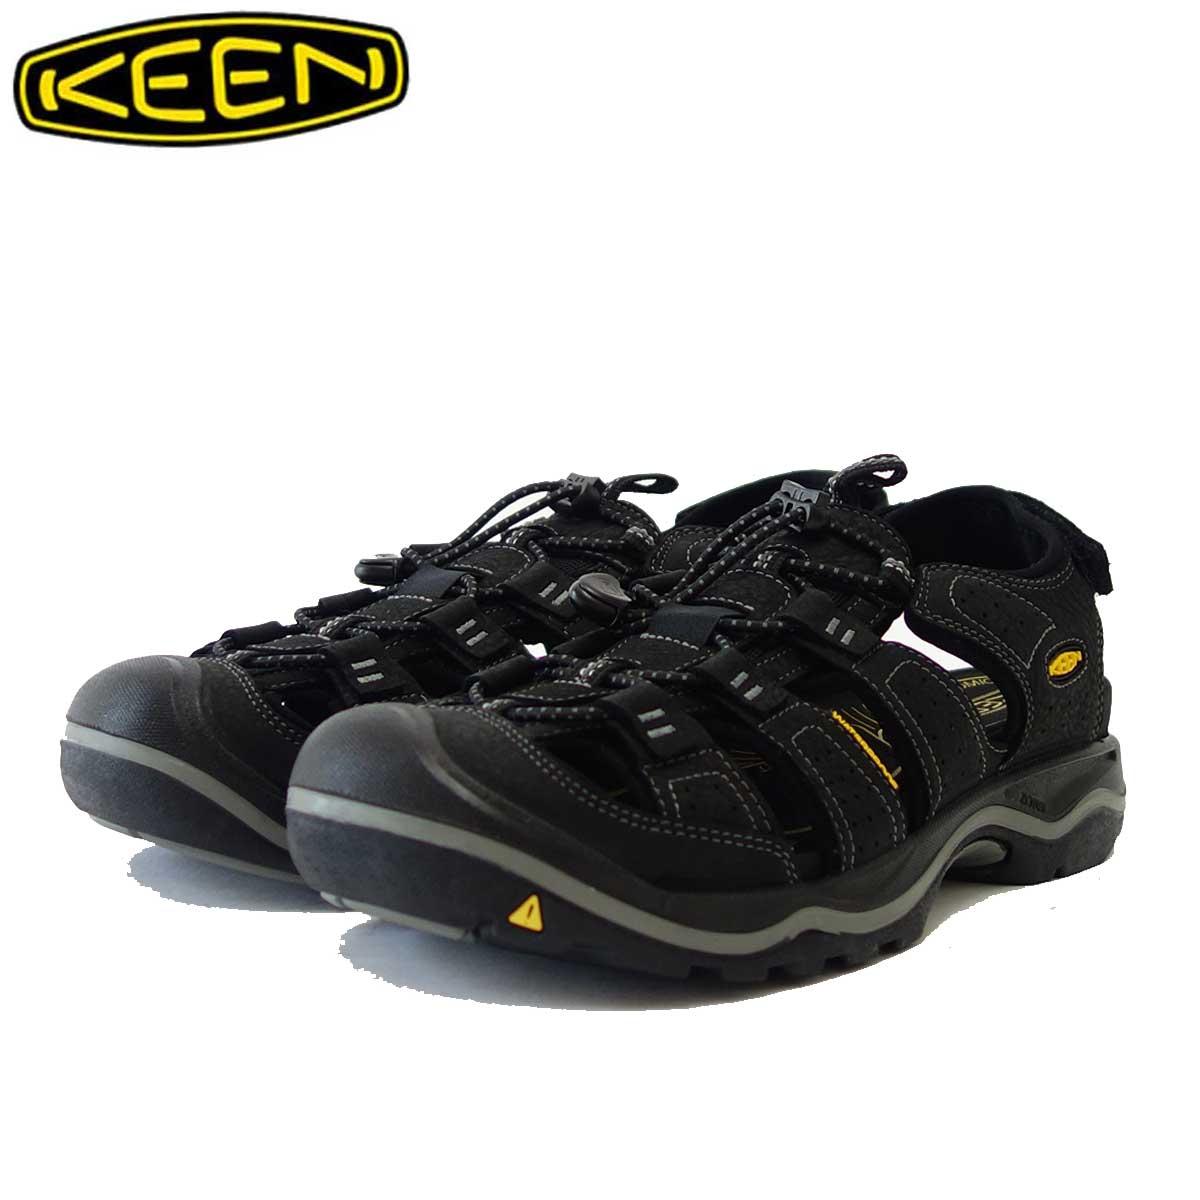 KEEN キーン Rialto(リアルト) 1021371(メンズ) カラー:Black/Gargoyle 「靴」